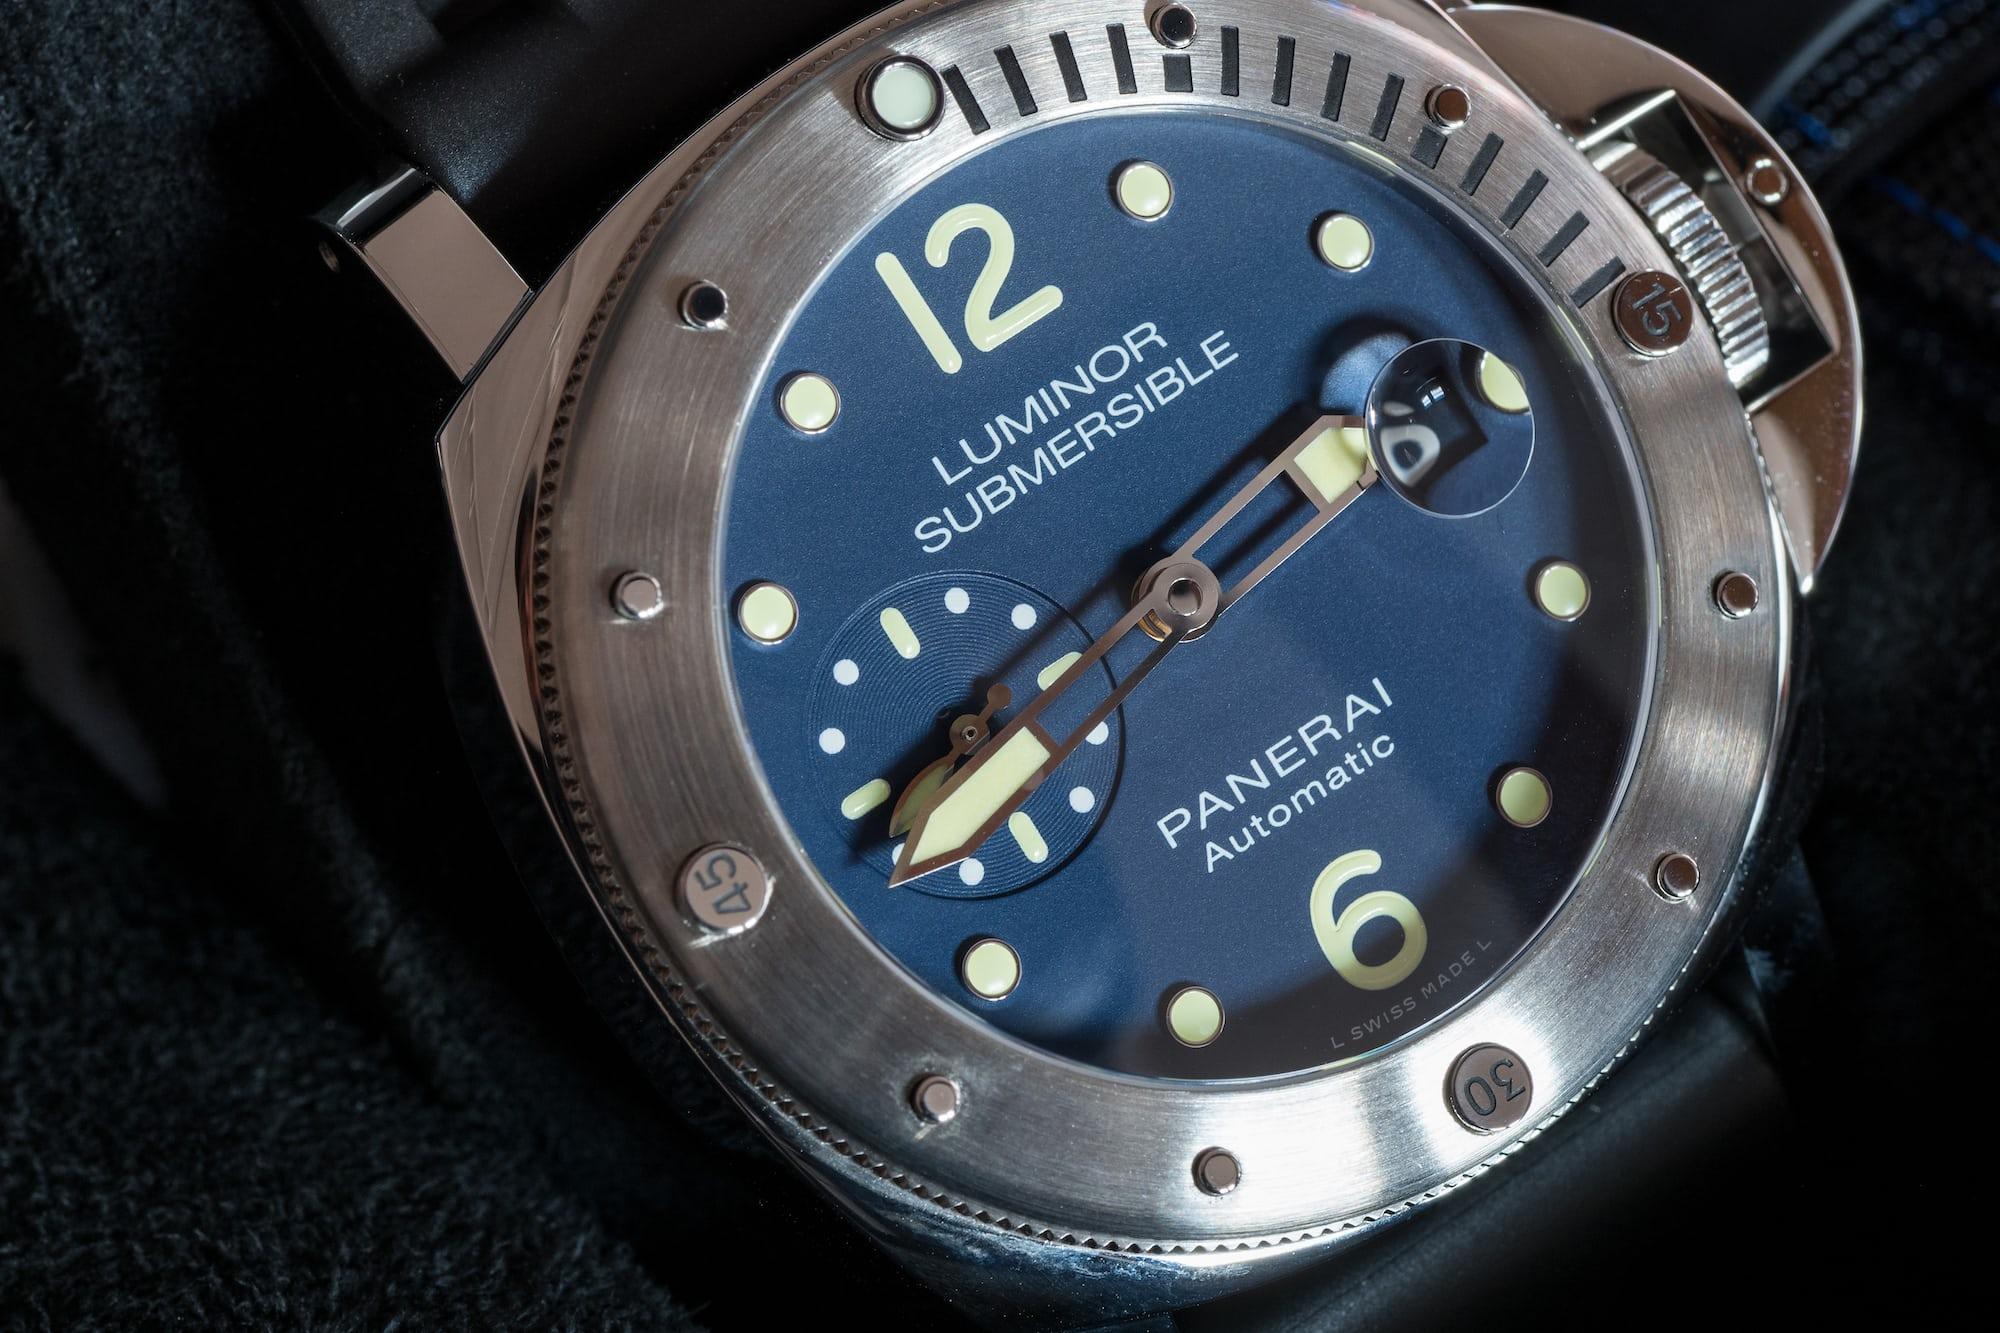 Panerai Luminor Submersible Acciaio PAM00731